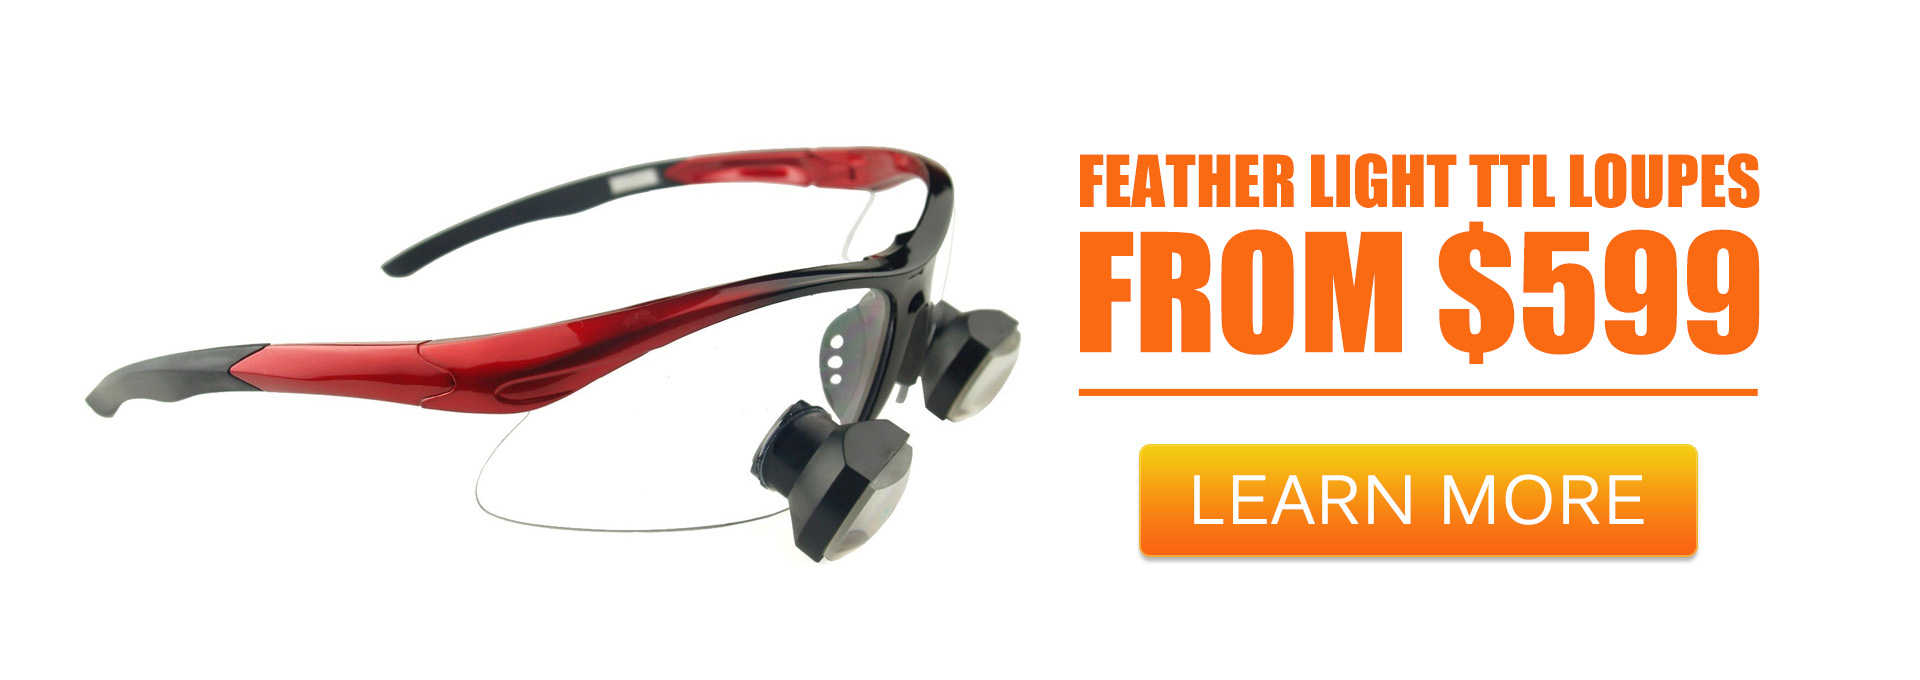 Feather Light TTl Loupes